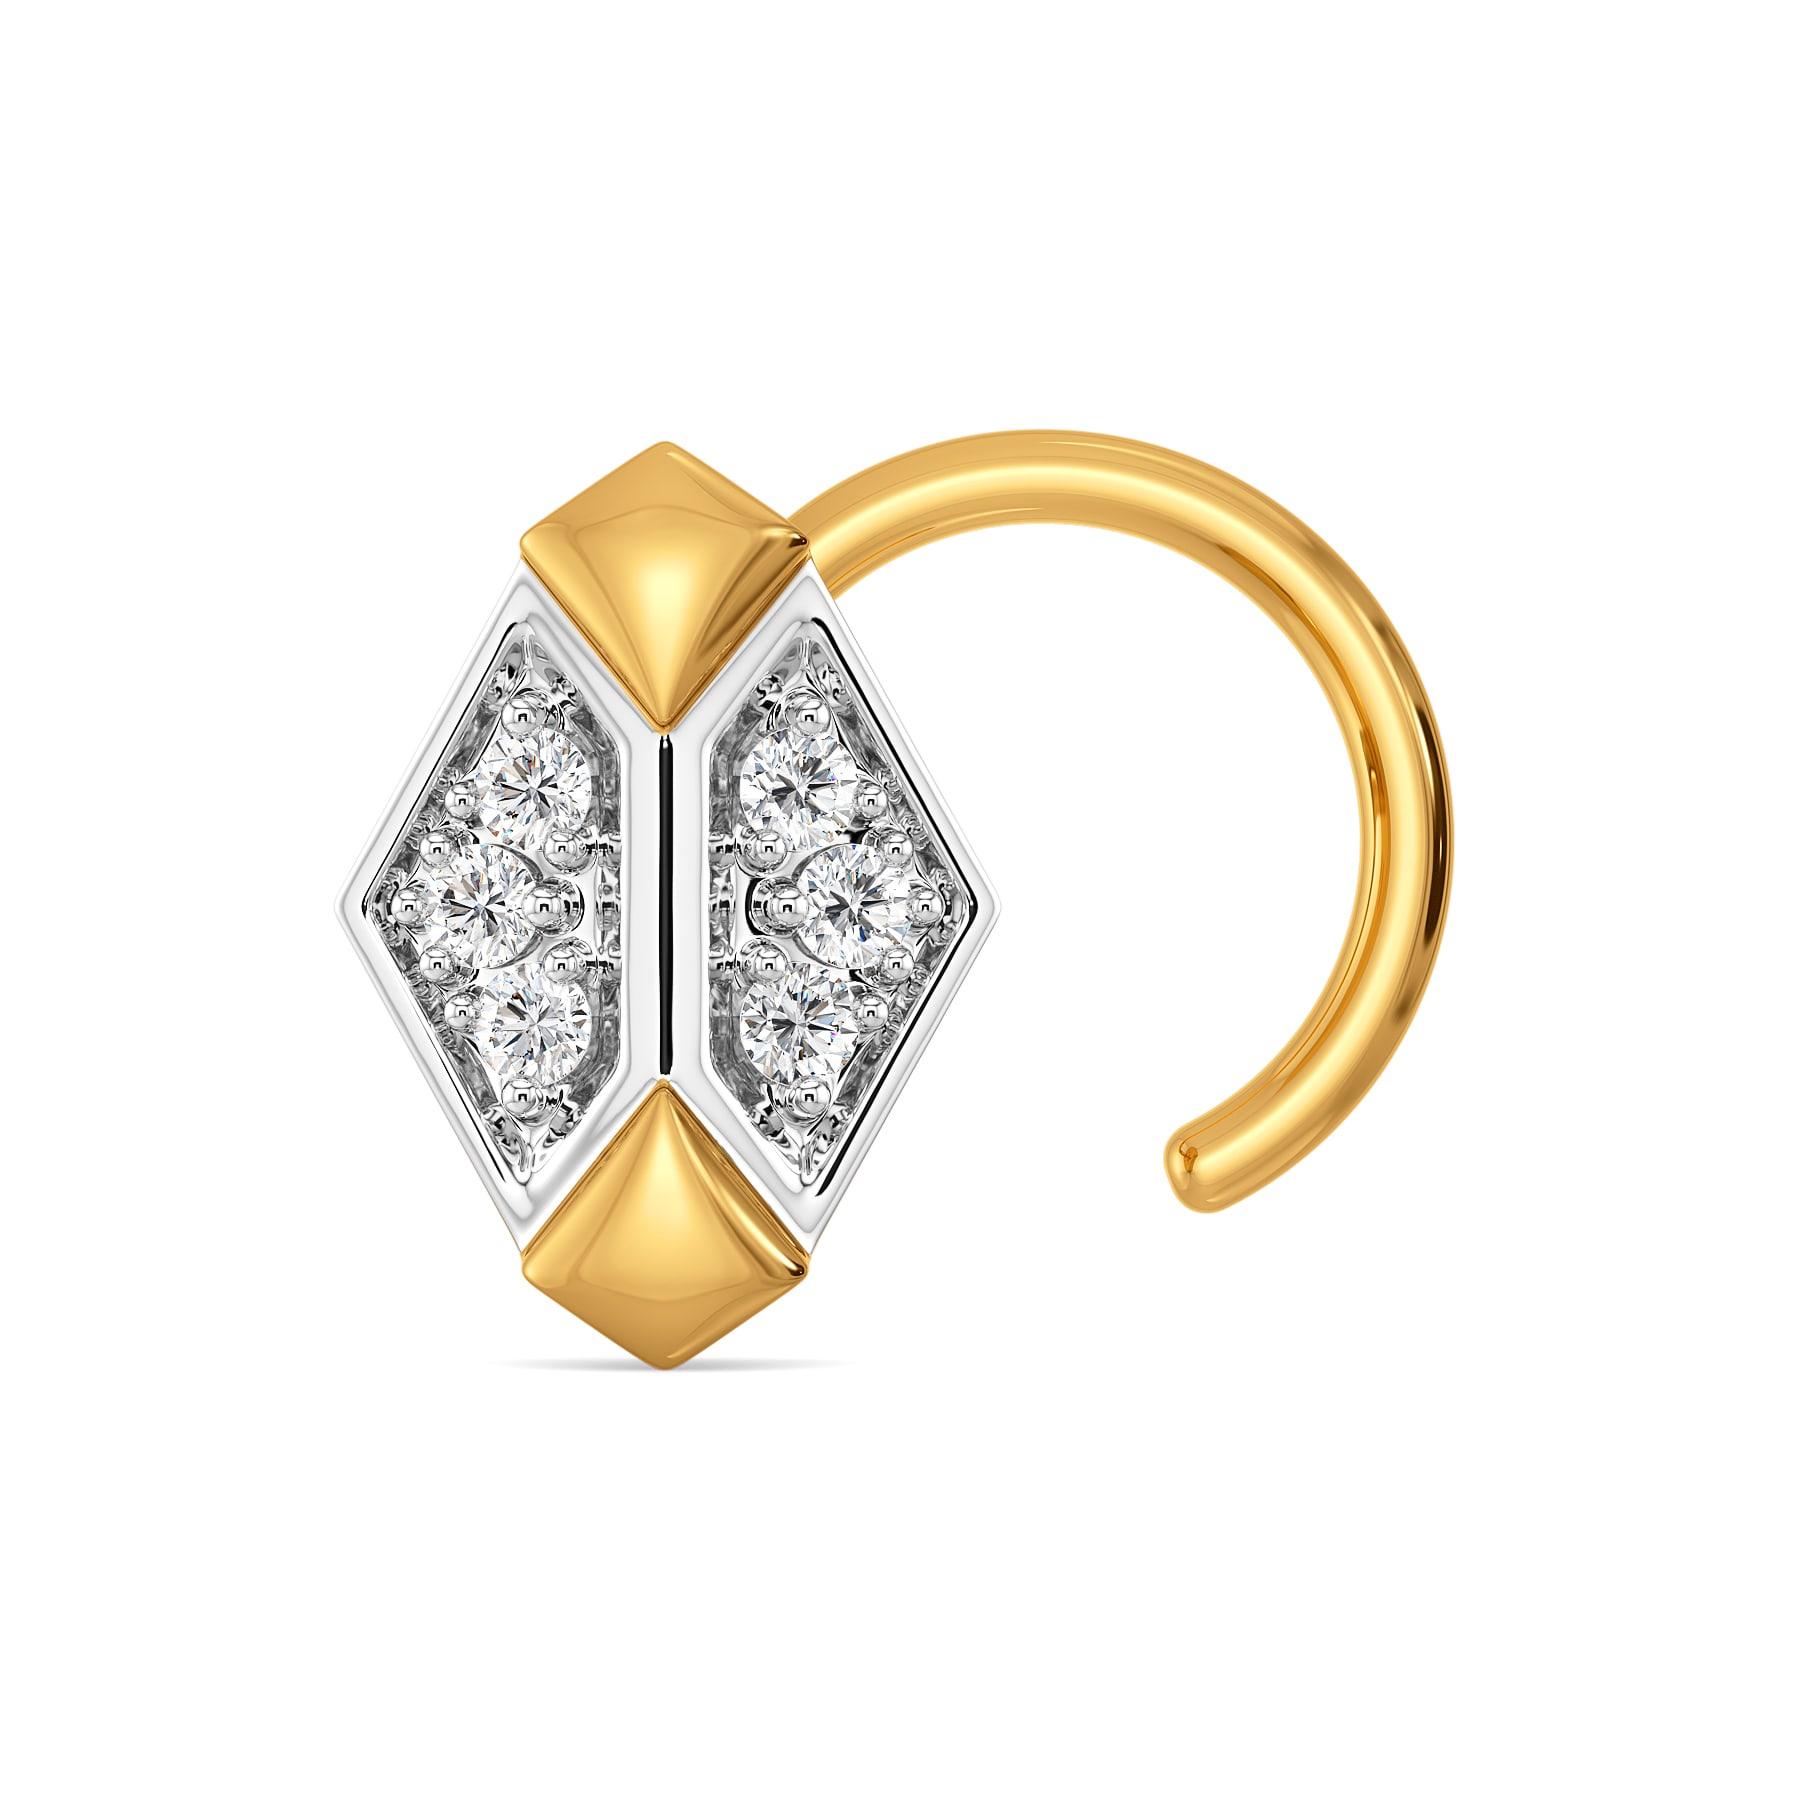 Subtle Save Diamond Nose Pins